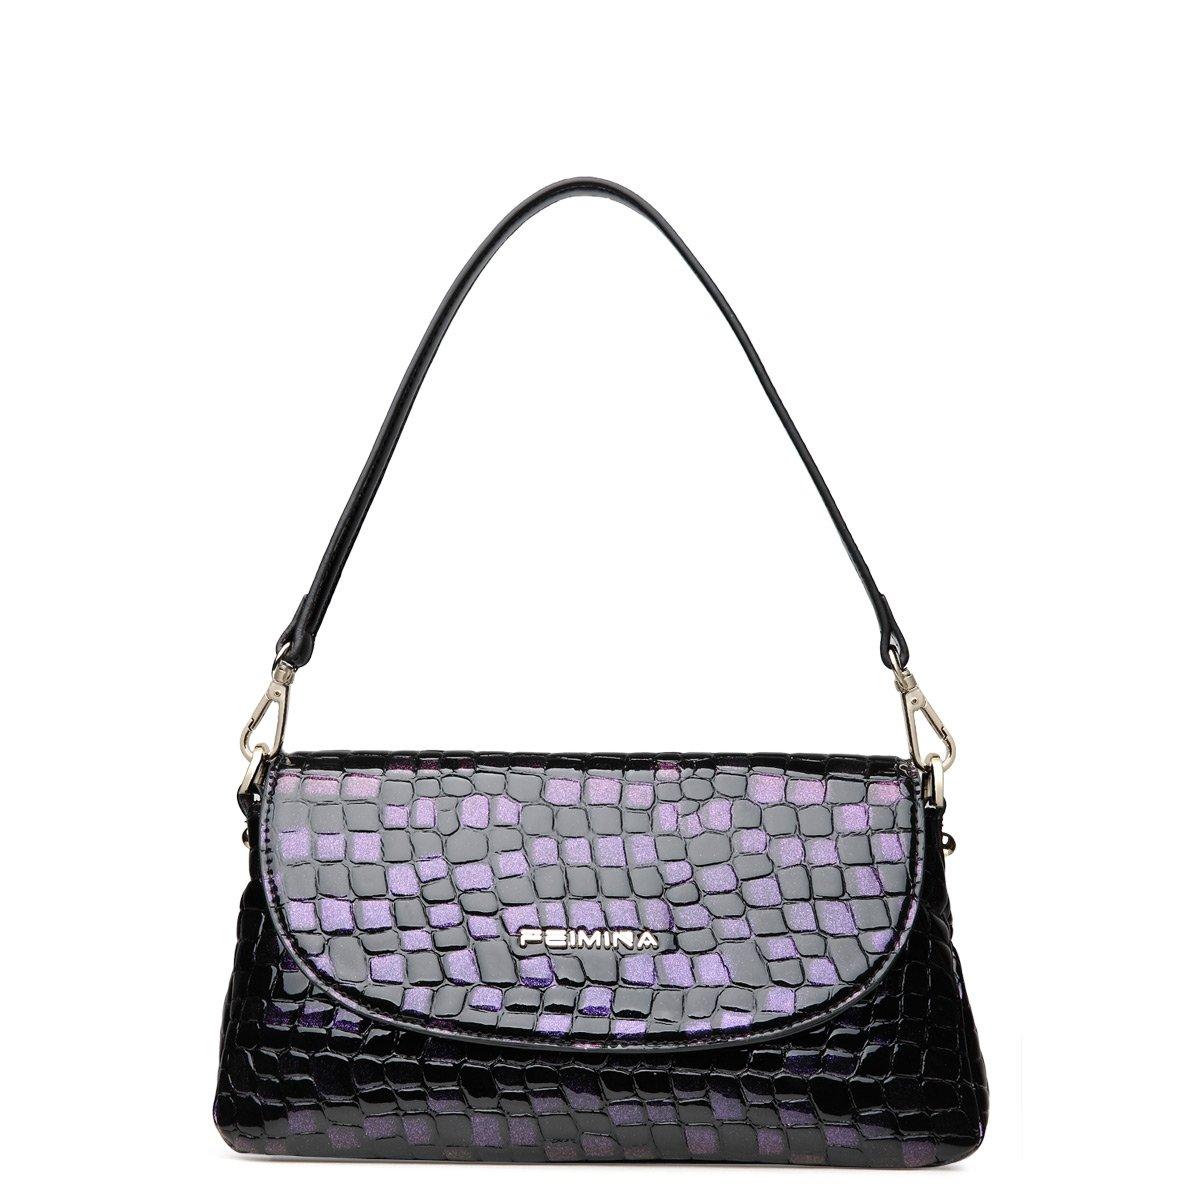 Black Purple Cowhide Genuine Leather Crocodile Envelope Baguette Bag Elegant Women Casual Party Small Crossbody Shoulder Flap Bag